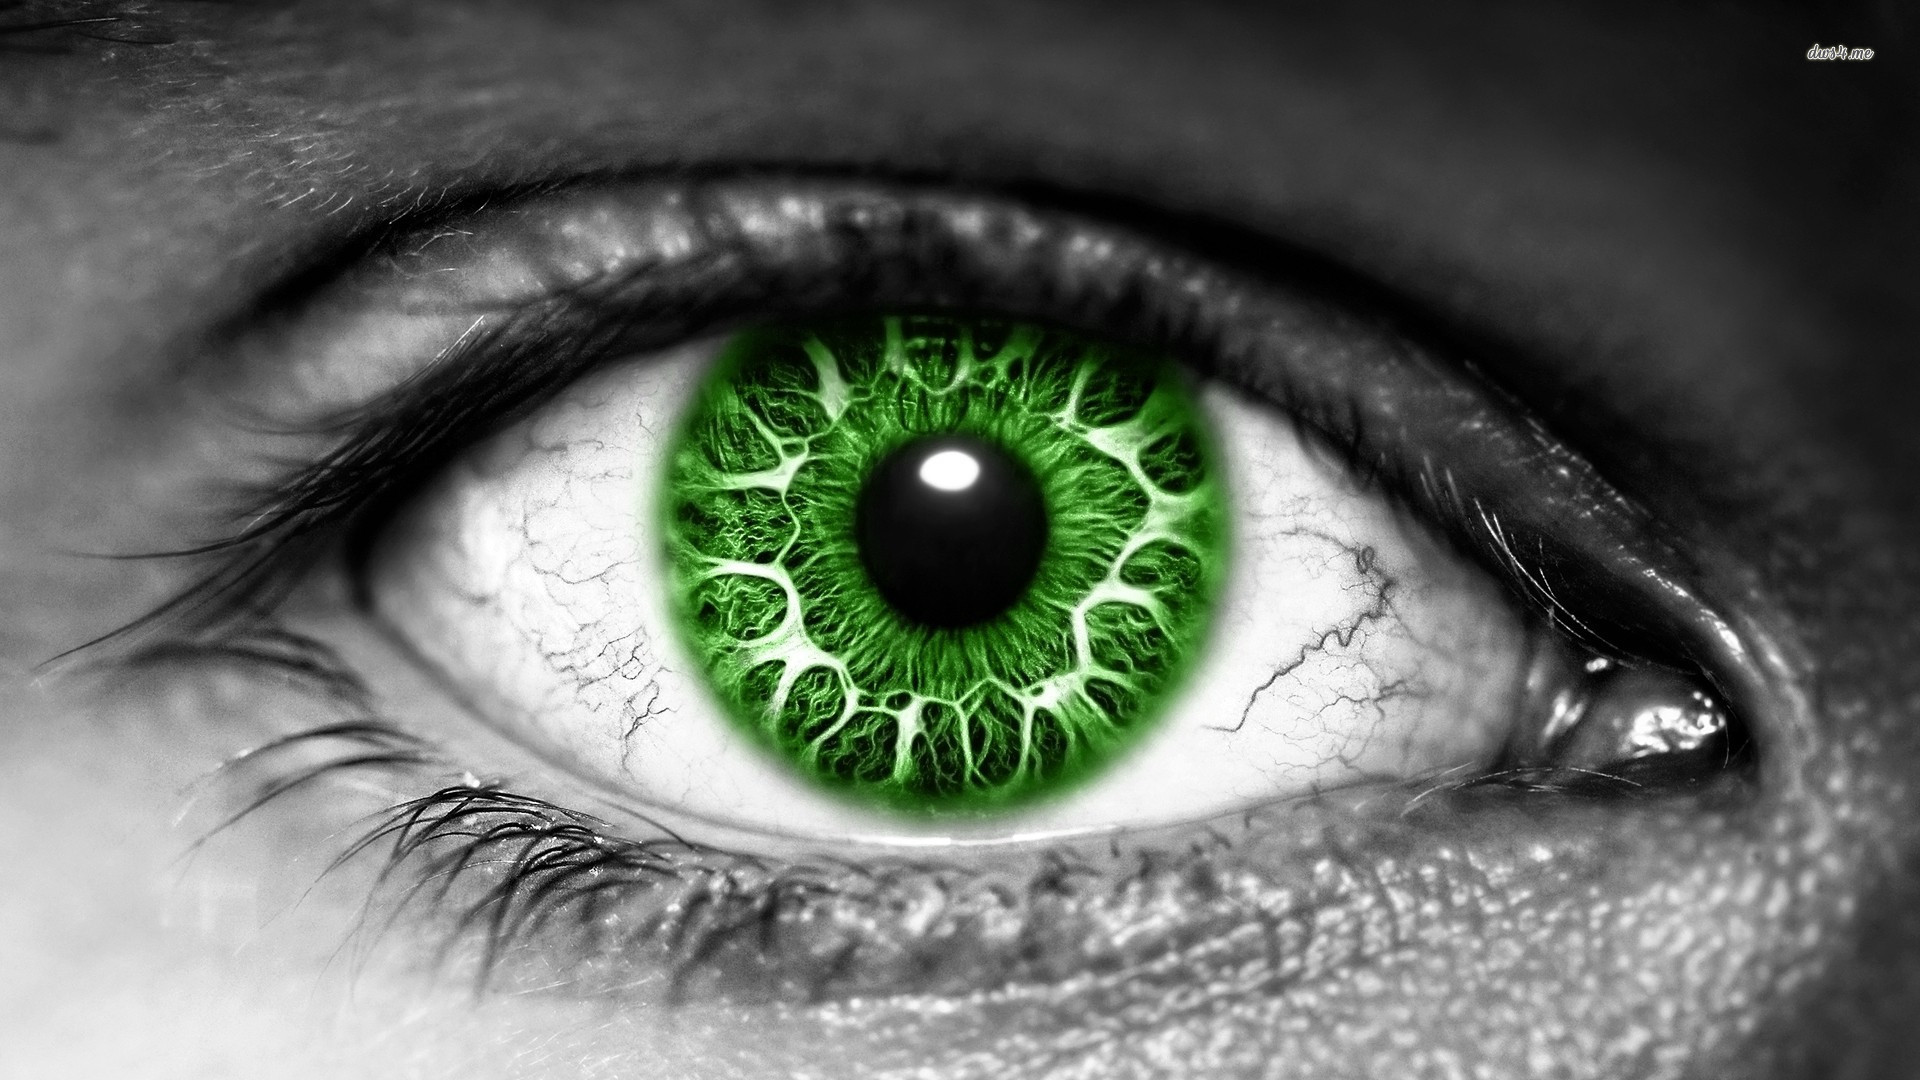 27+] Green Eye Wallpapers on WallpaperSafari.